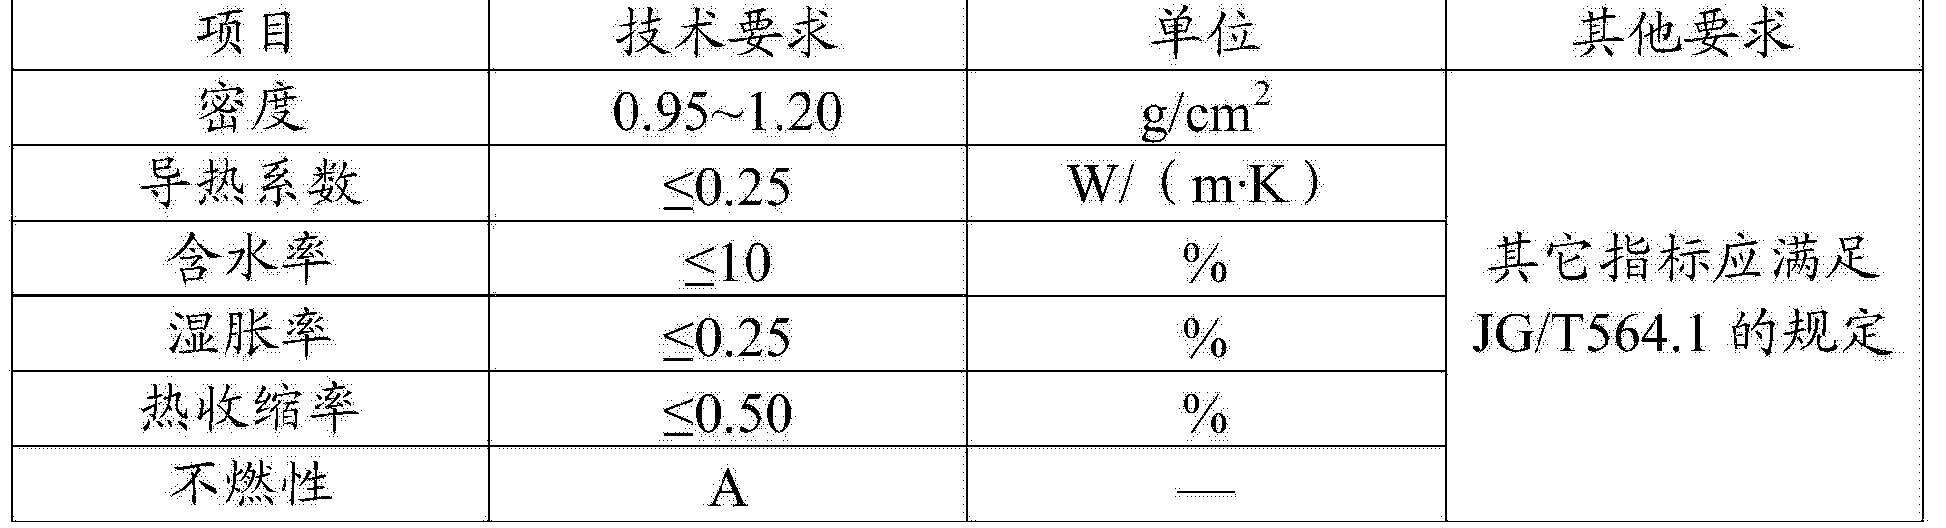 Figure CN204571010UD00063